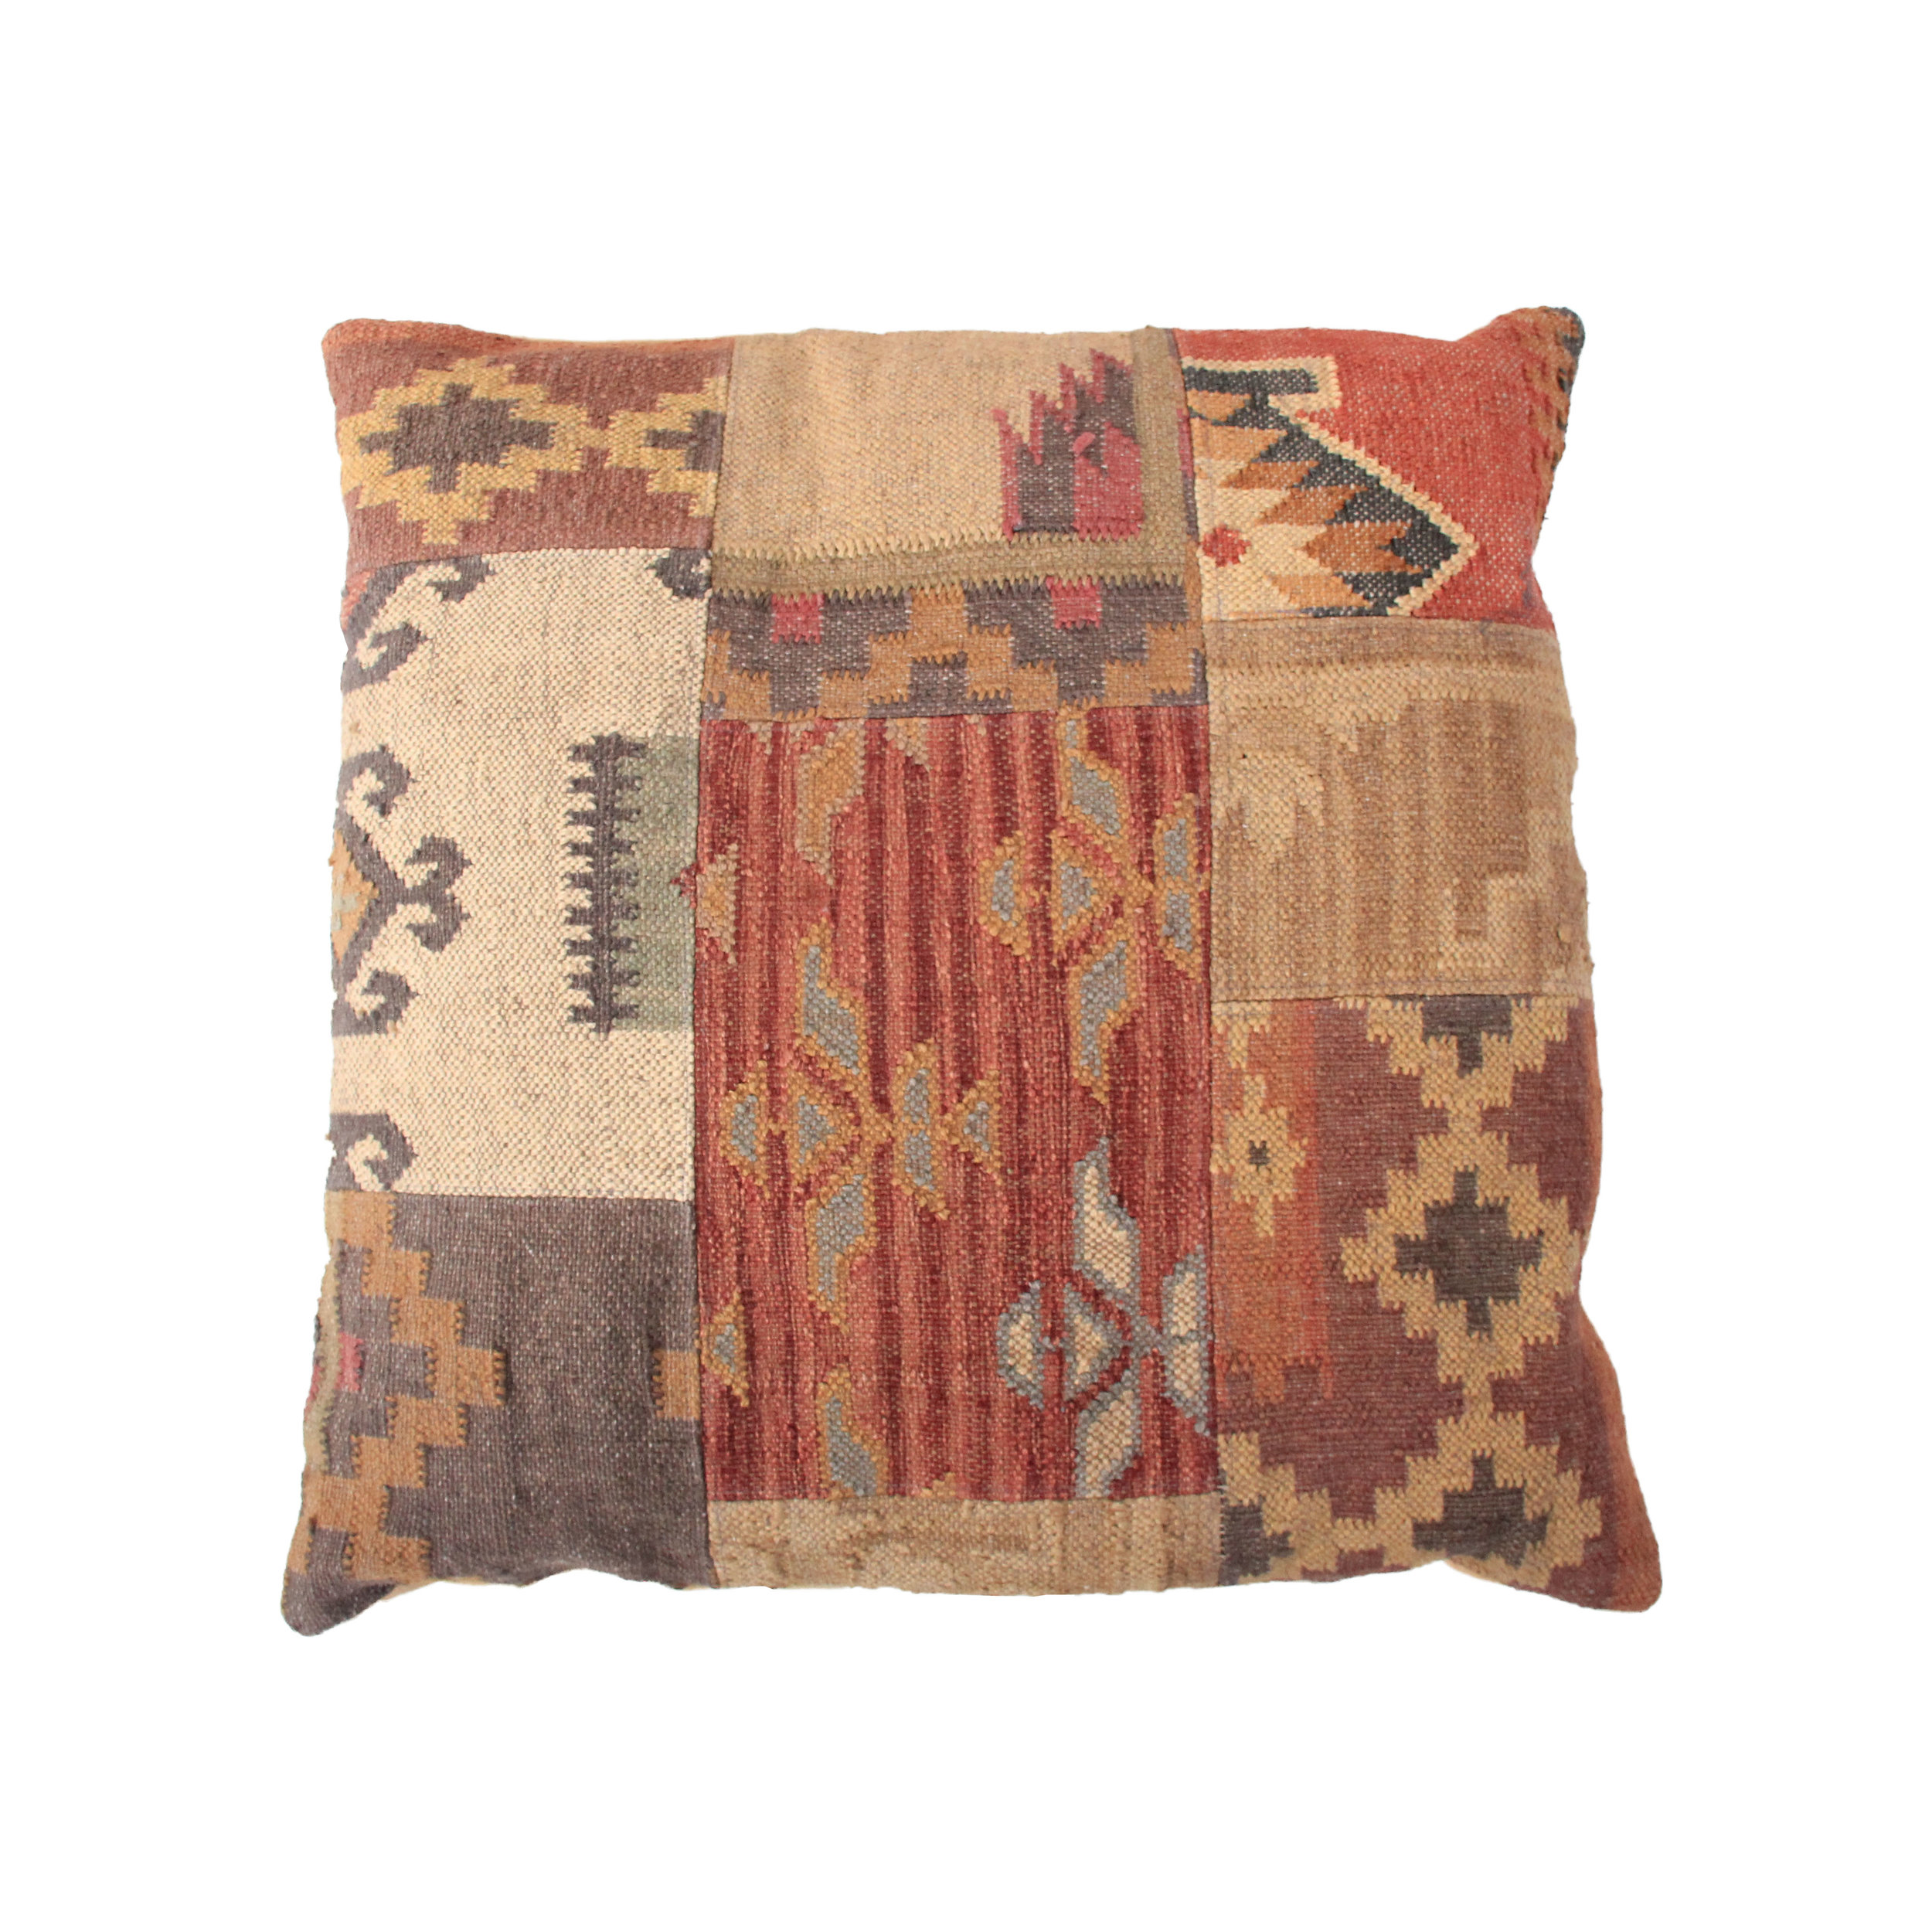 Vintage Kilim Floor Pillow